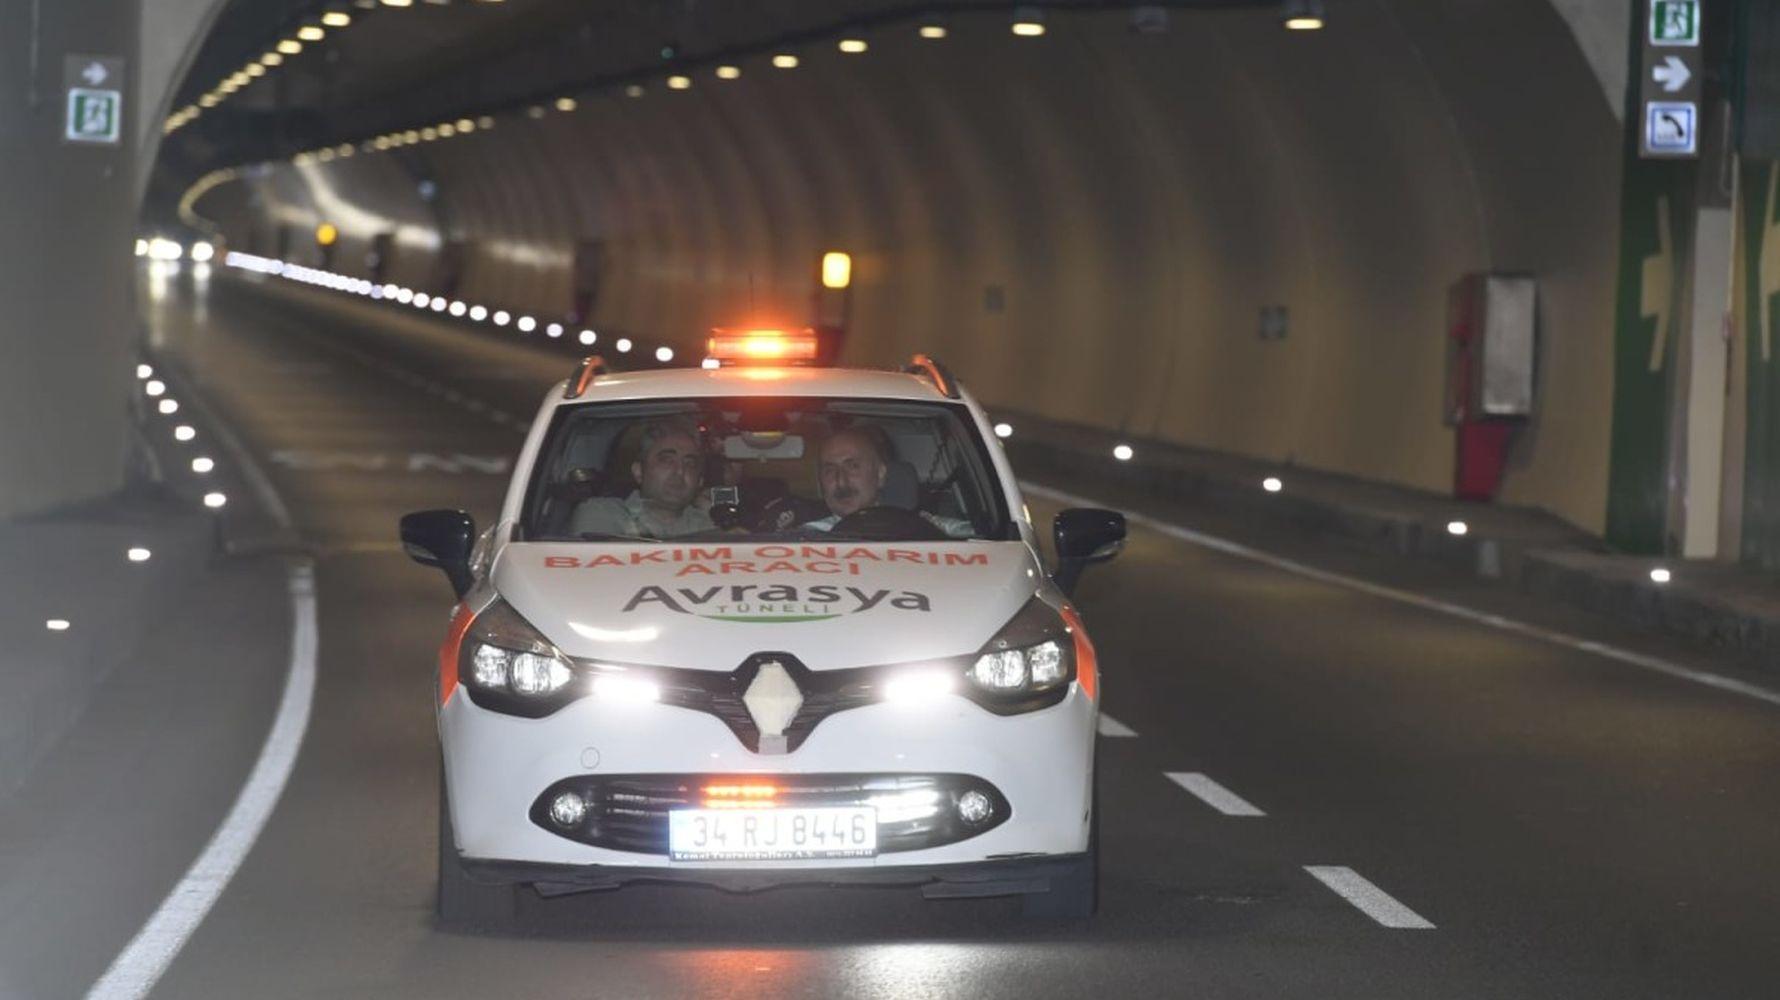 Eurasia tunnel saved drivers hourly time